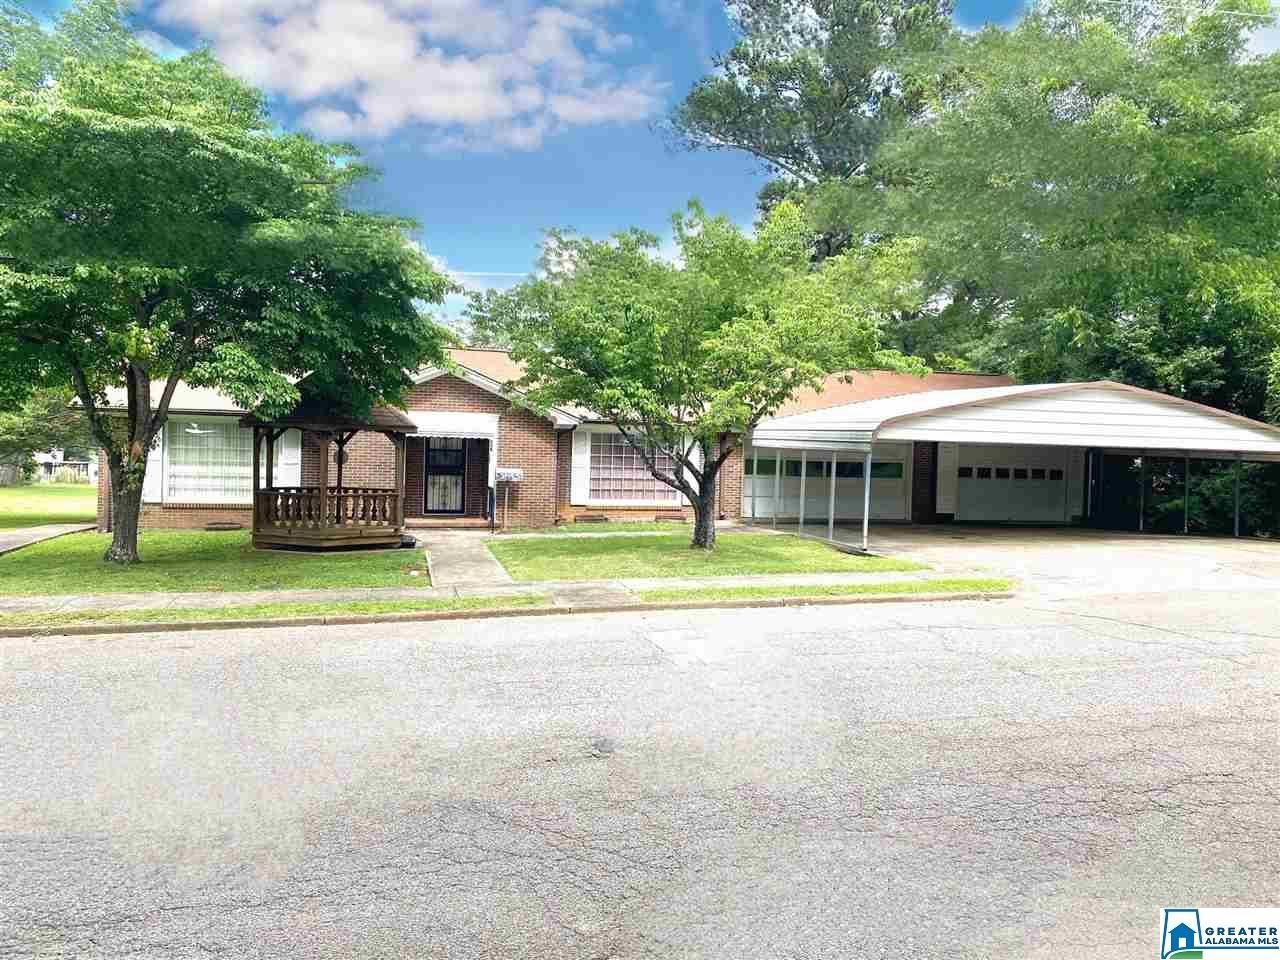 308 S CENTER AVE, Piedmont, AL 36272 - MLS#: 886369